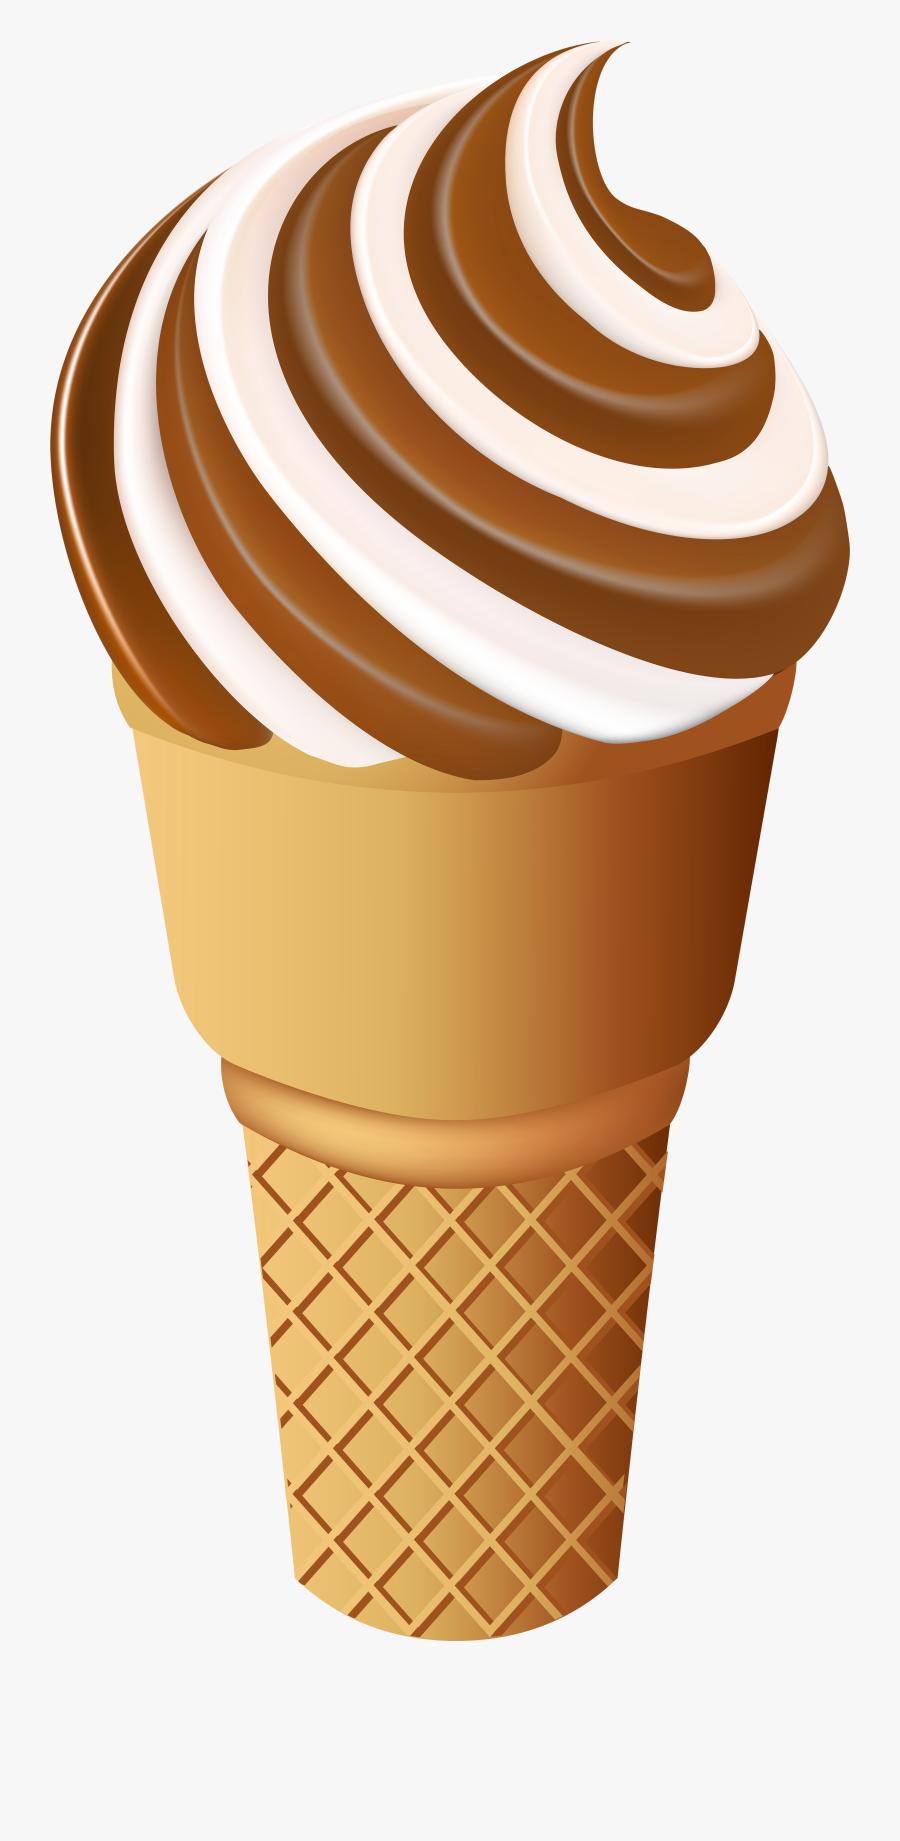 Ice Cream Clipart Png, Transparent Clipart